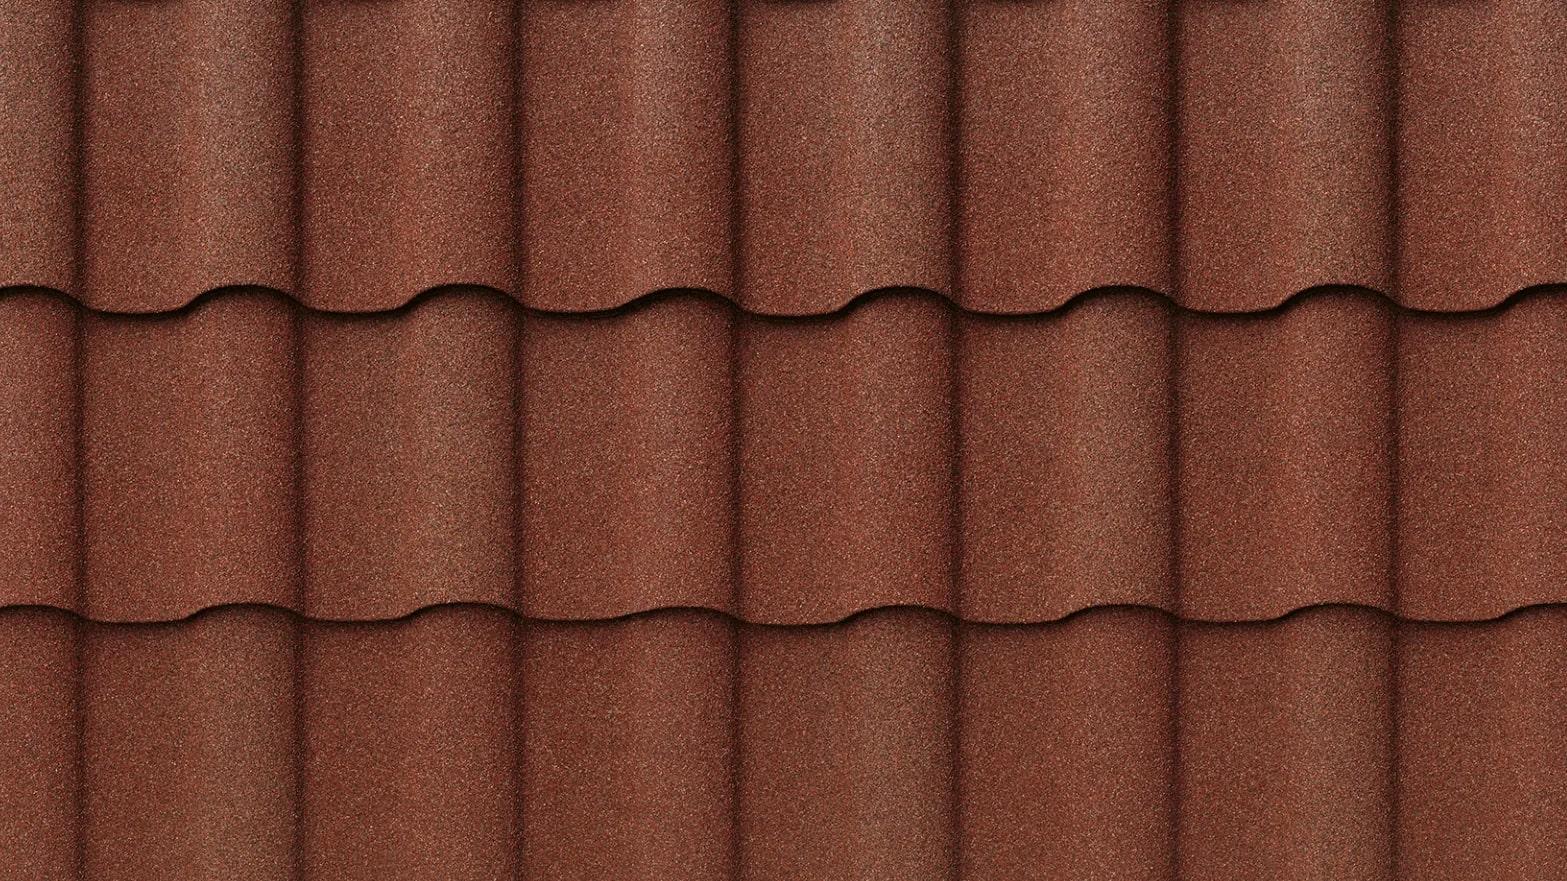 villa-tile-pattern2-max-min